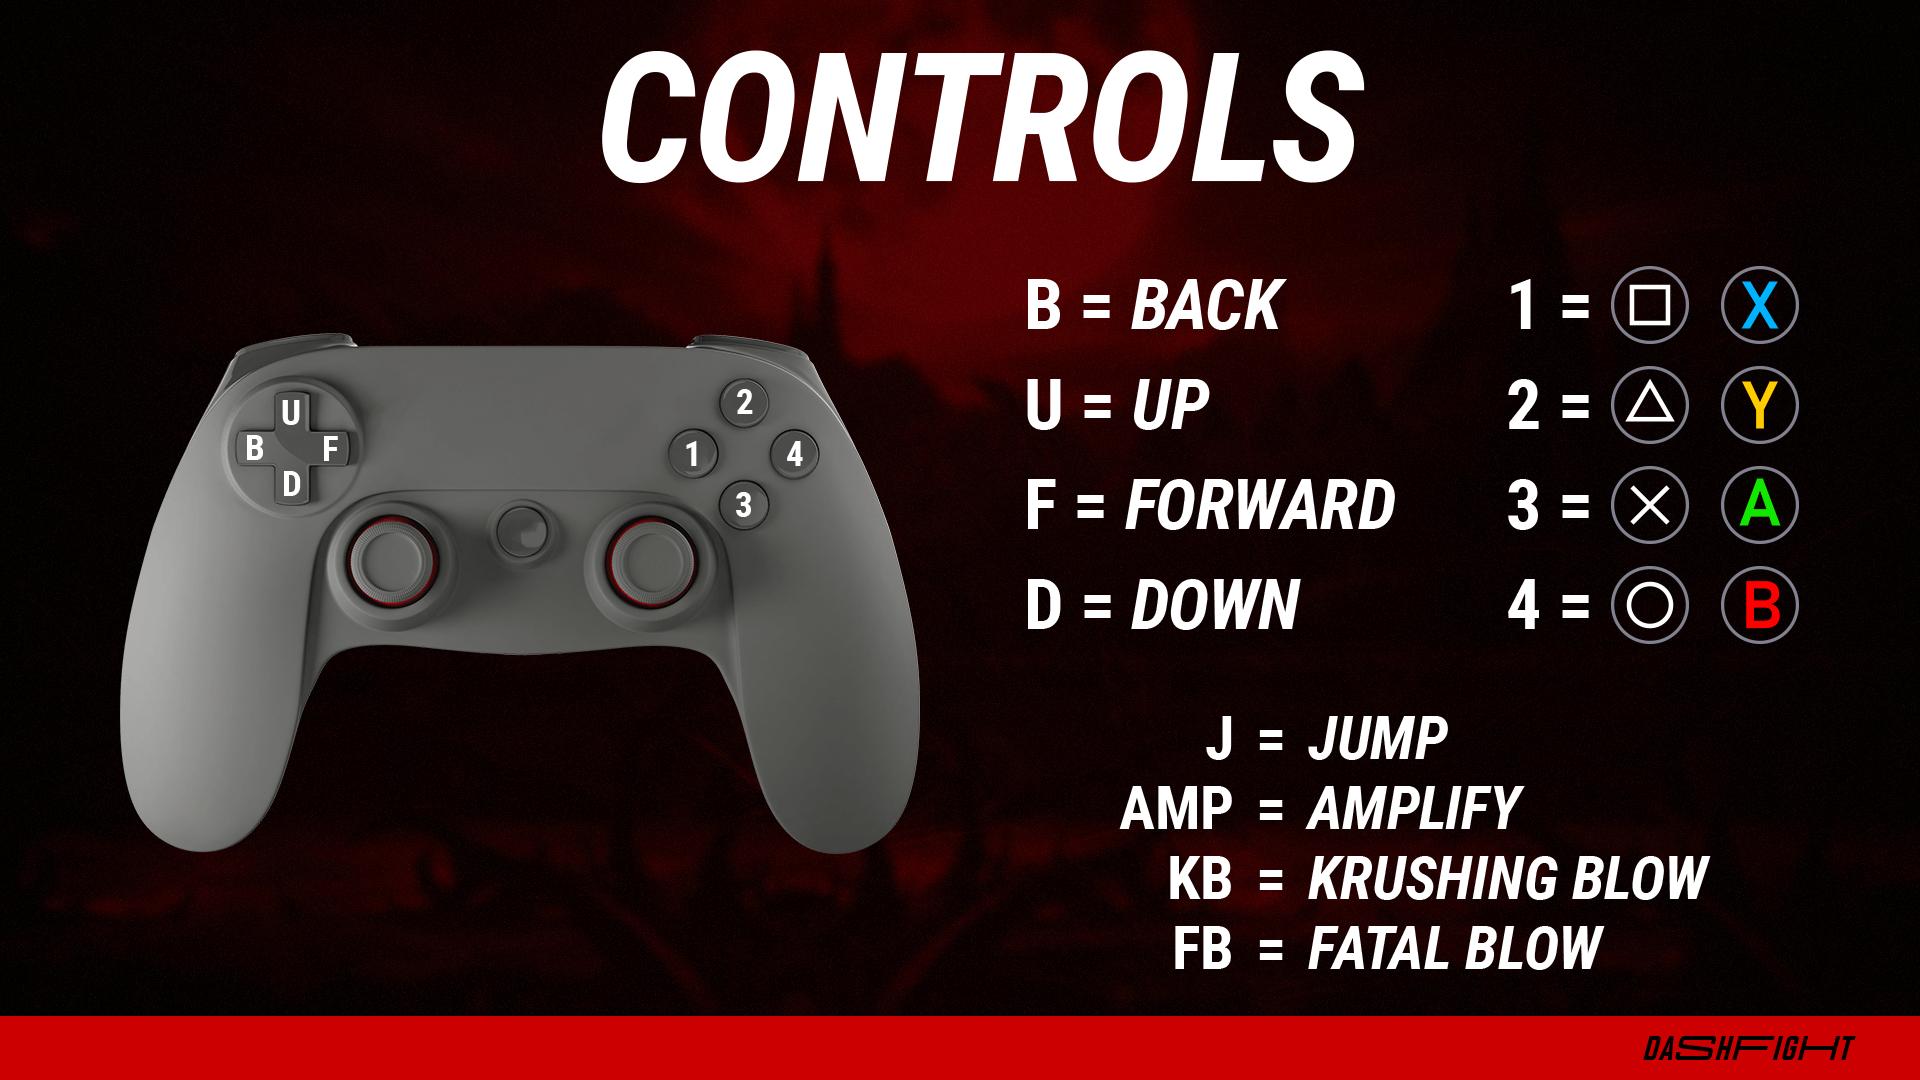 Controls in Mortal Kombat 11 - PlayStation and Xbox gamepads